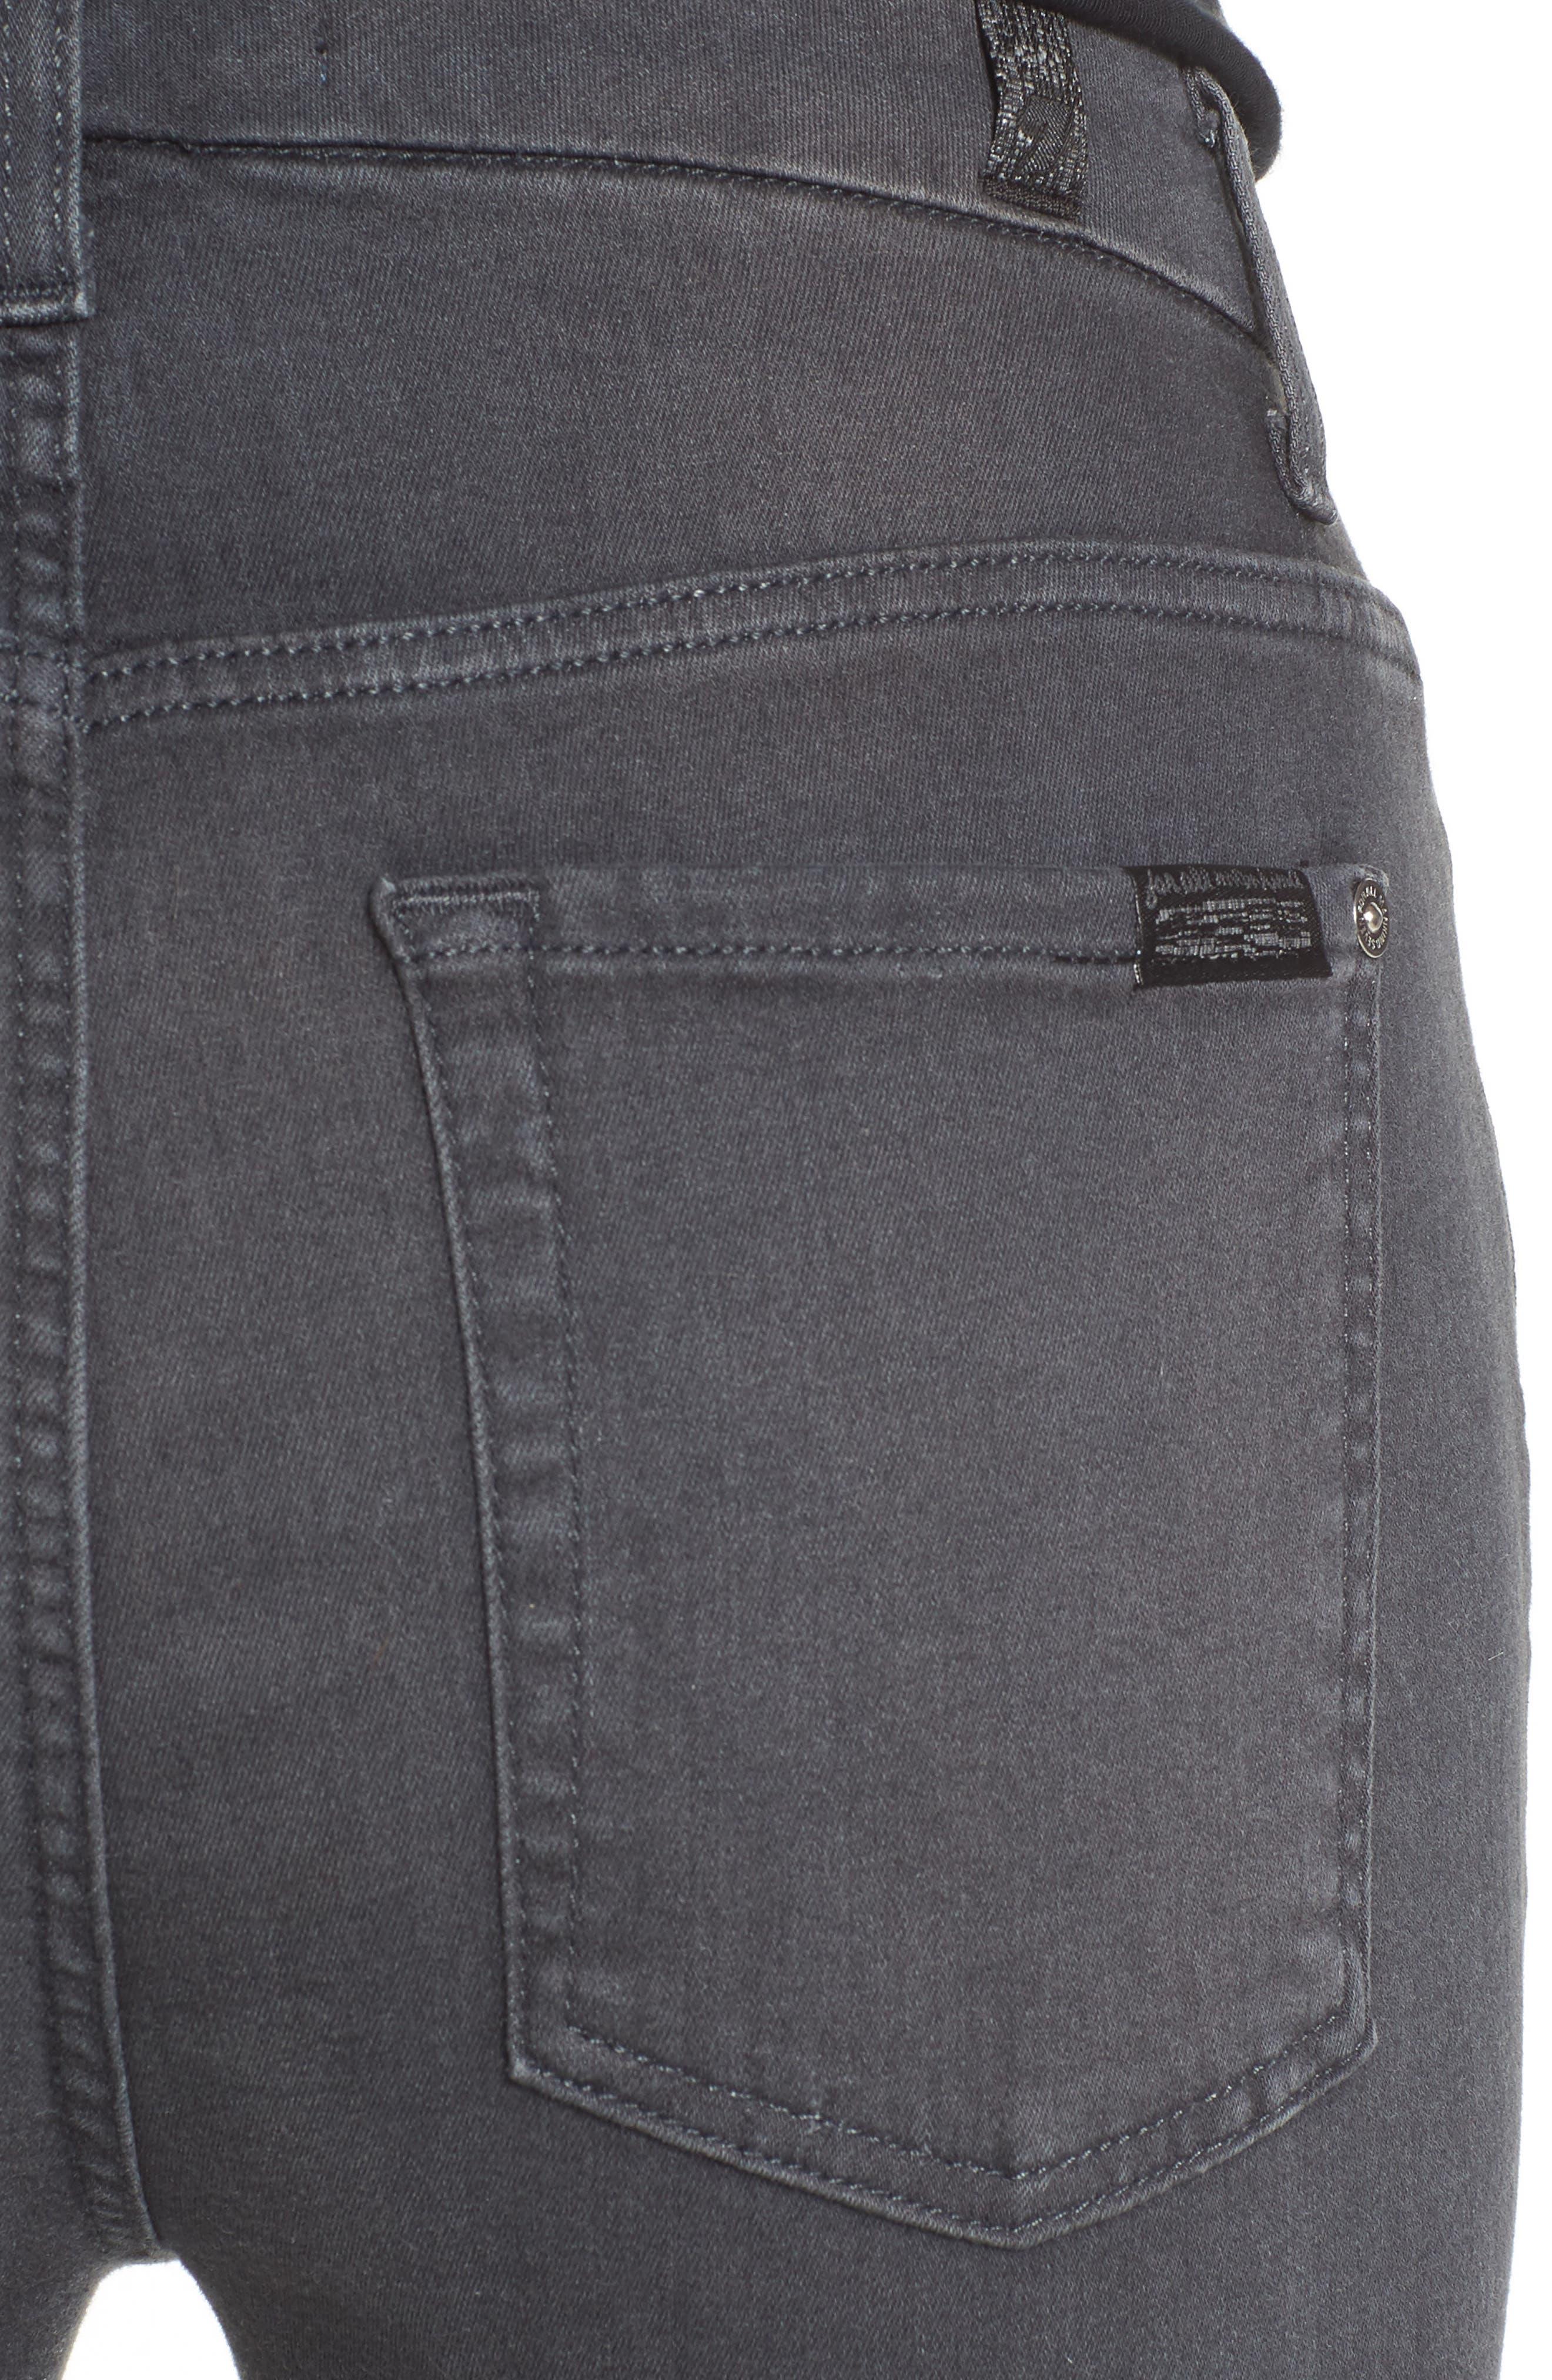 b(air) High Waist Skinny Jeans,                             Alternate thumbnail 4, color,                             B(Air) Smoke